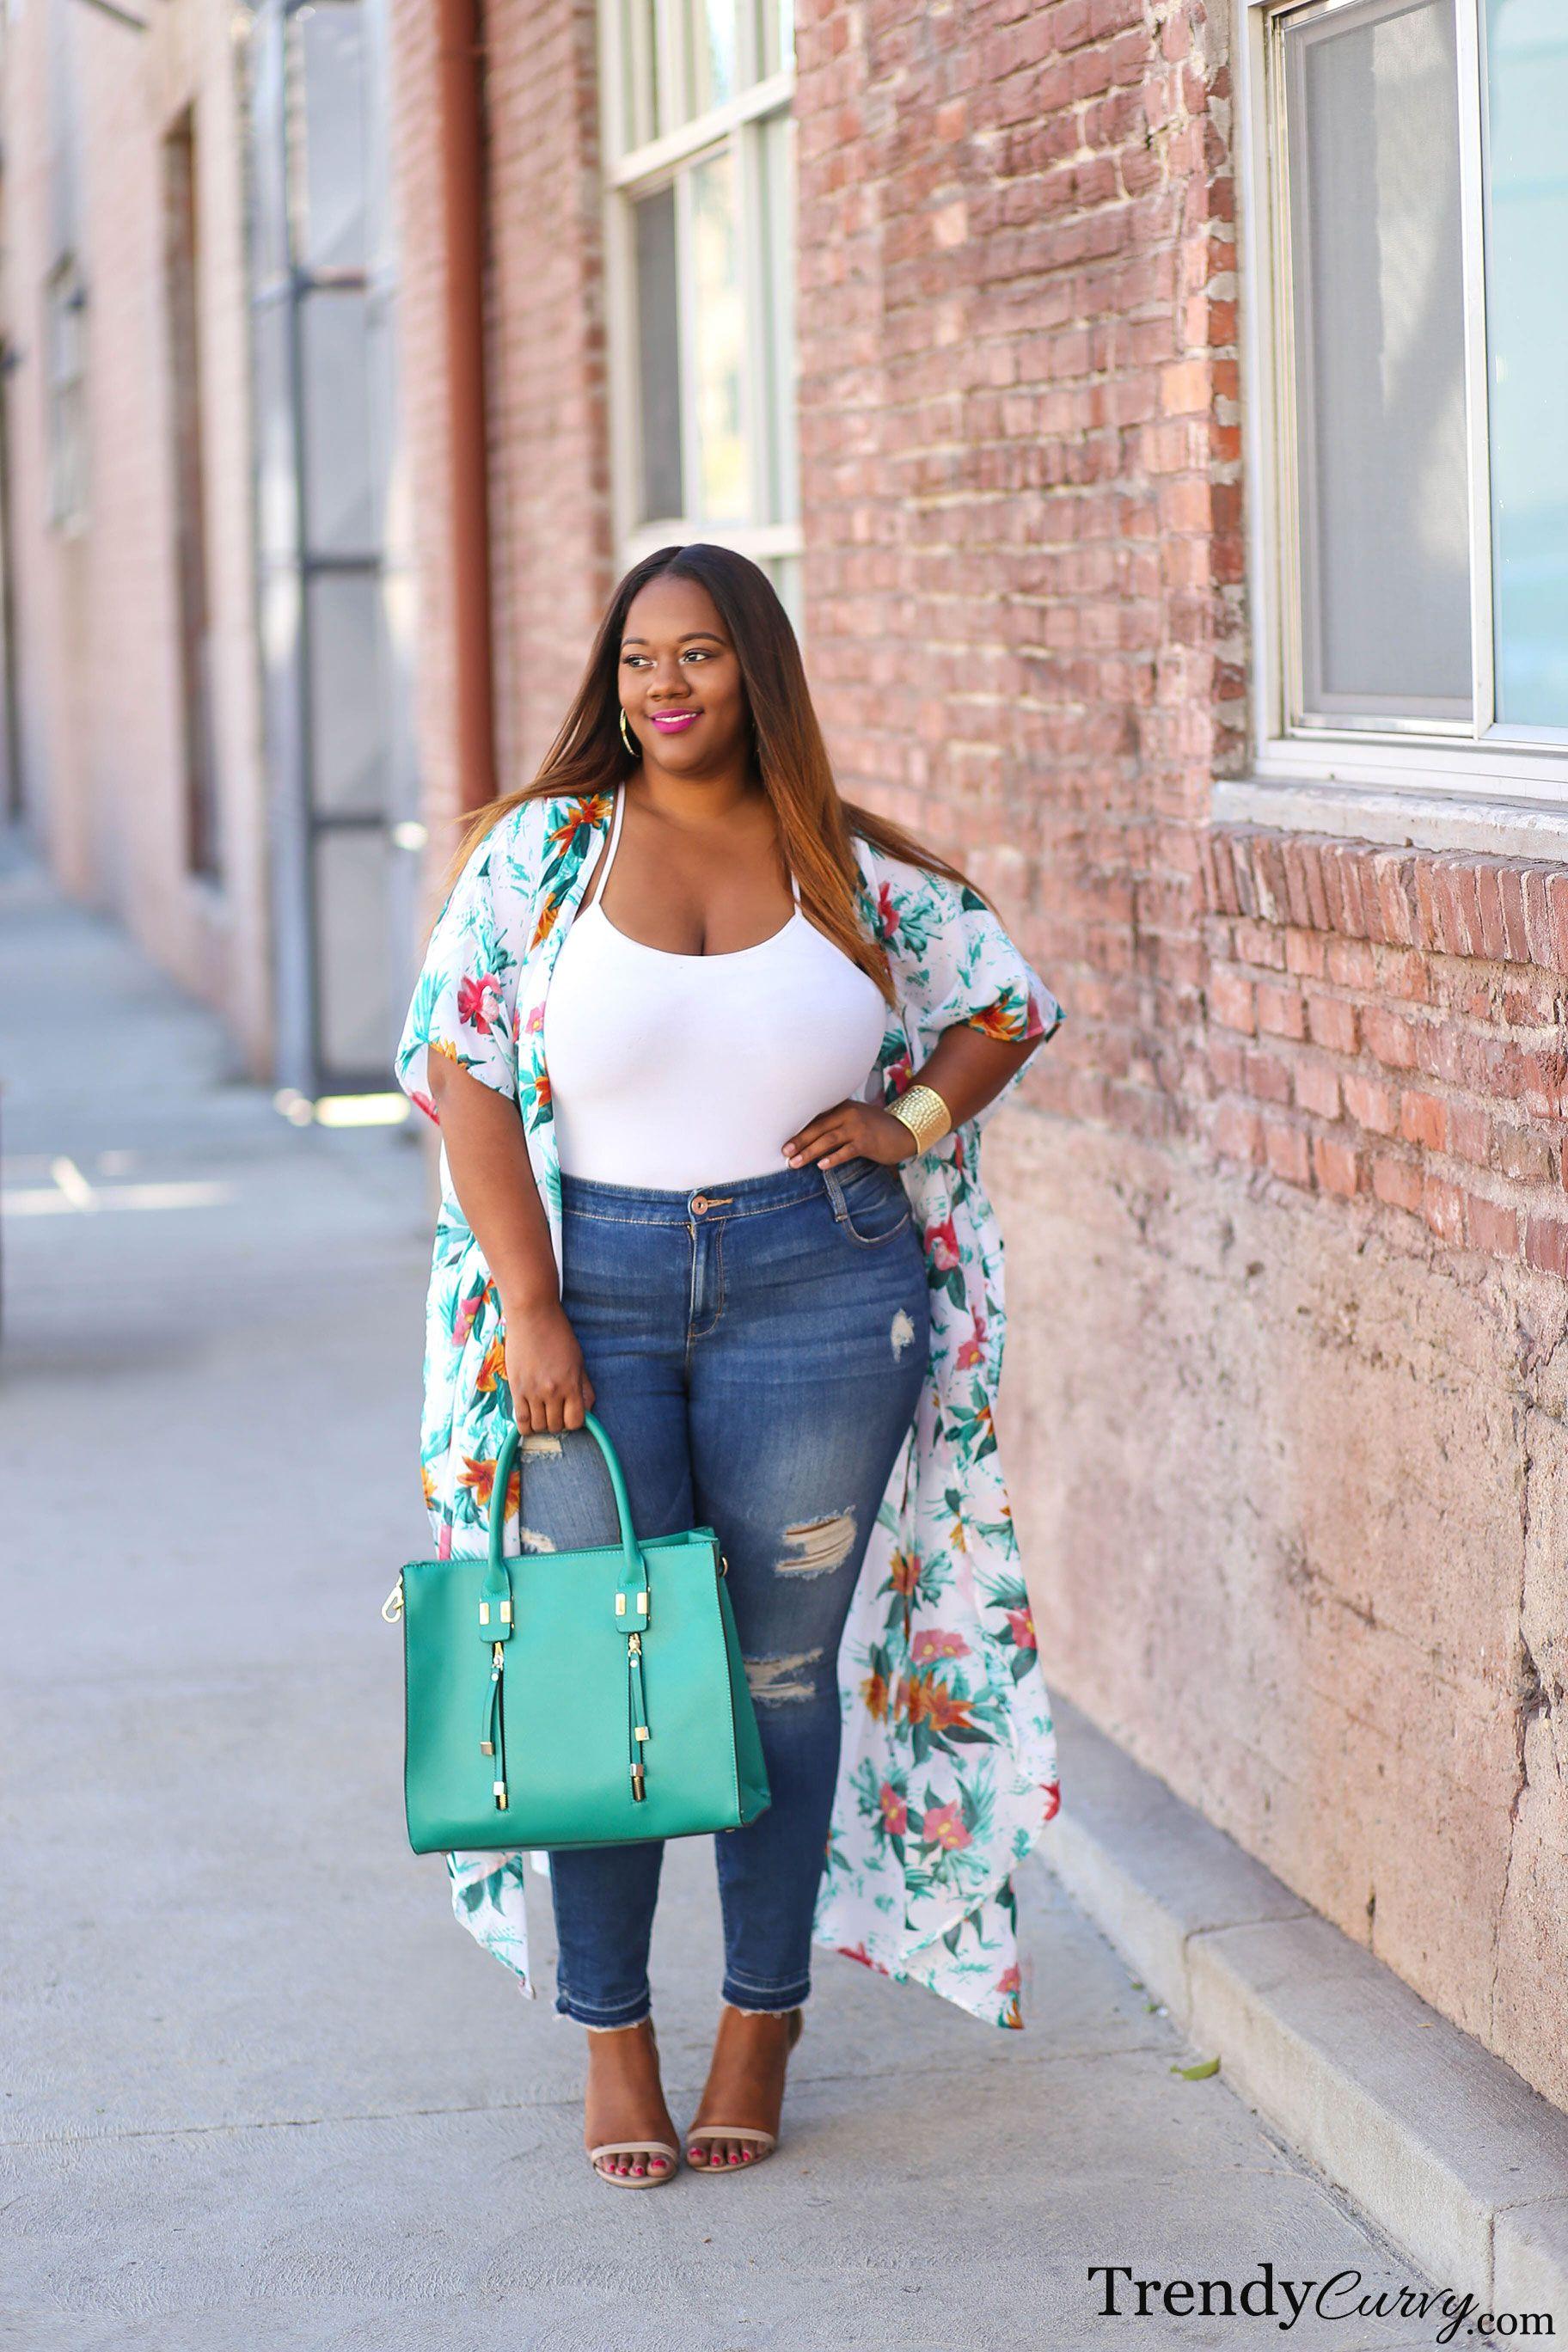 Pinterest fashion for proportion women - Spring Florals Plus Size Fashion Trendycurvy